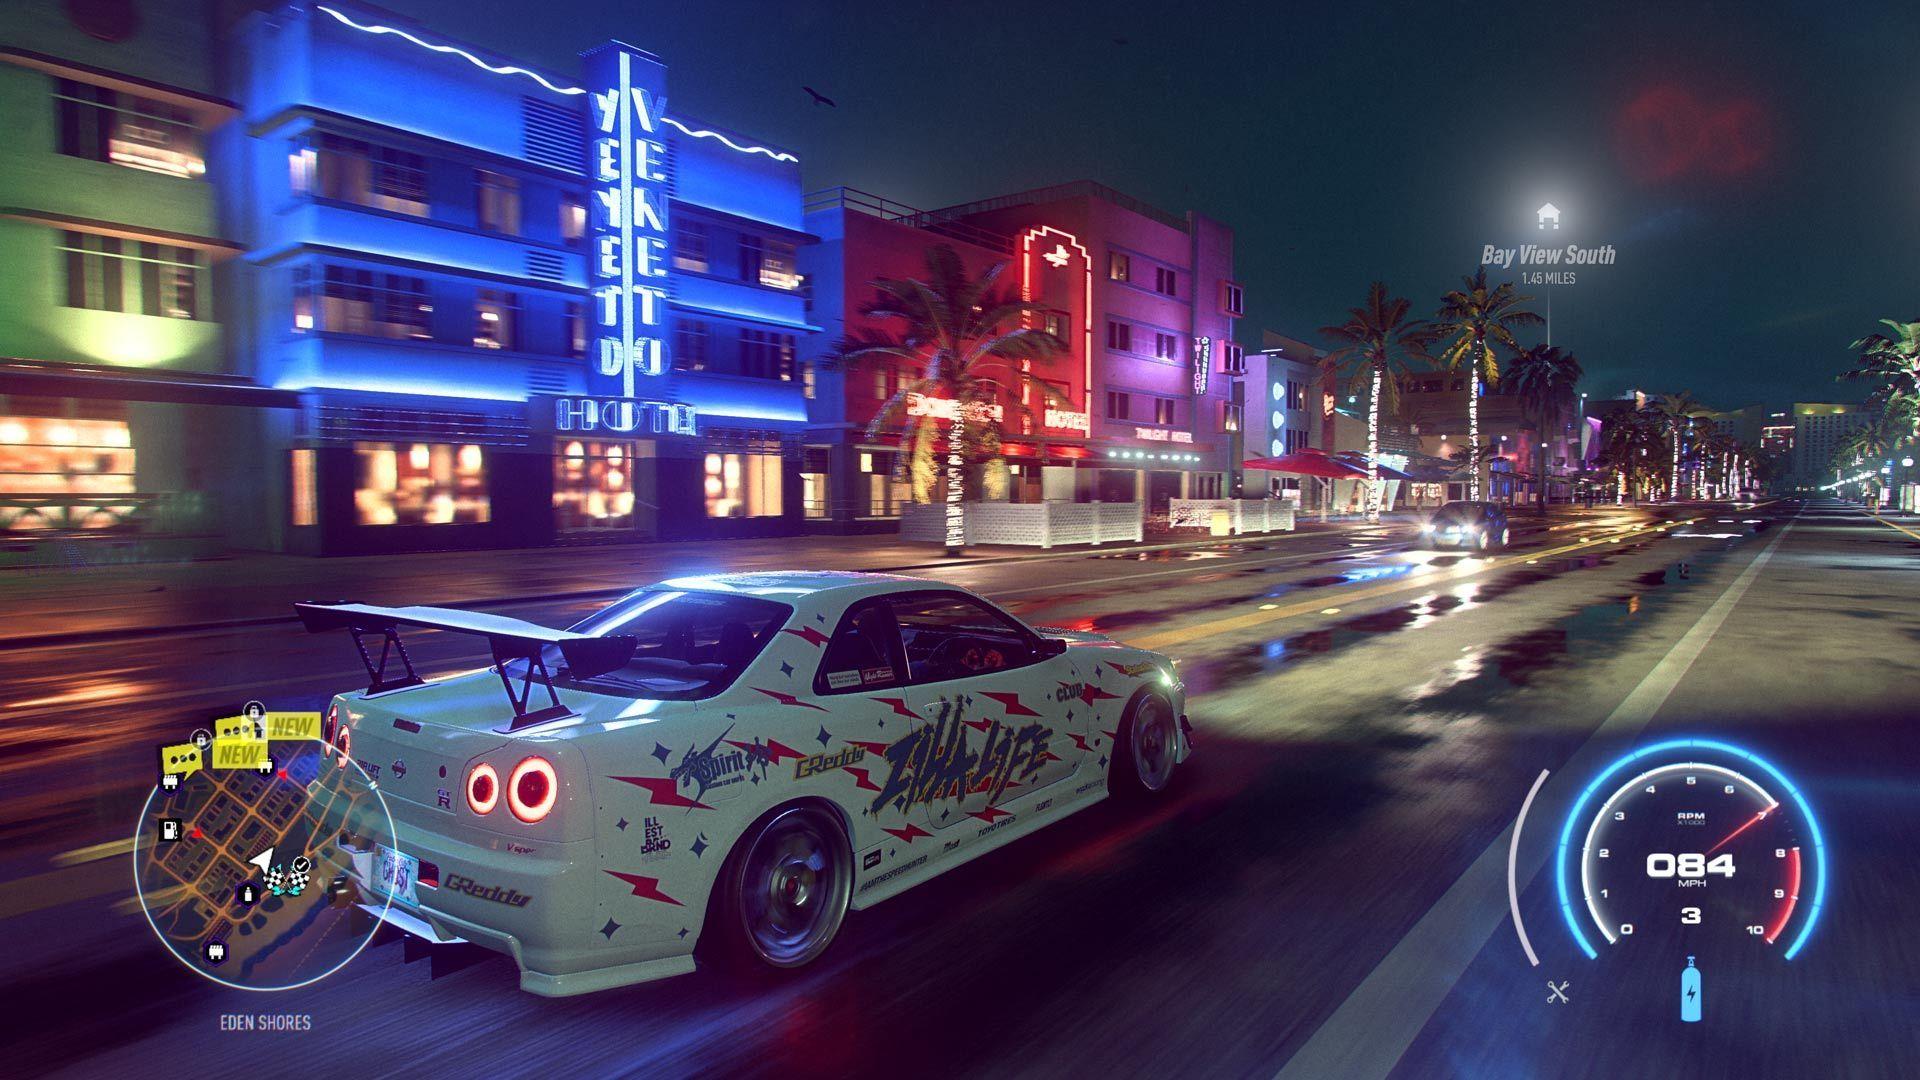 خرید اکانت اشتراکی بازی Need For Speed Heat